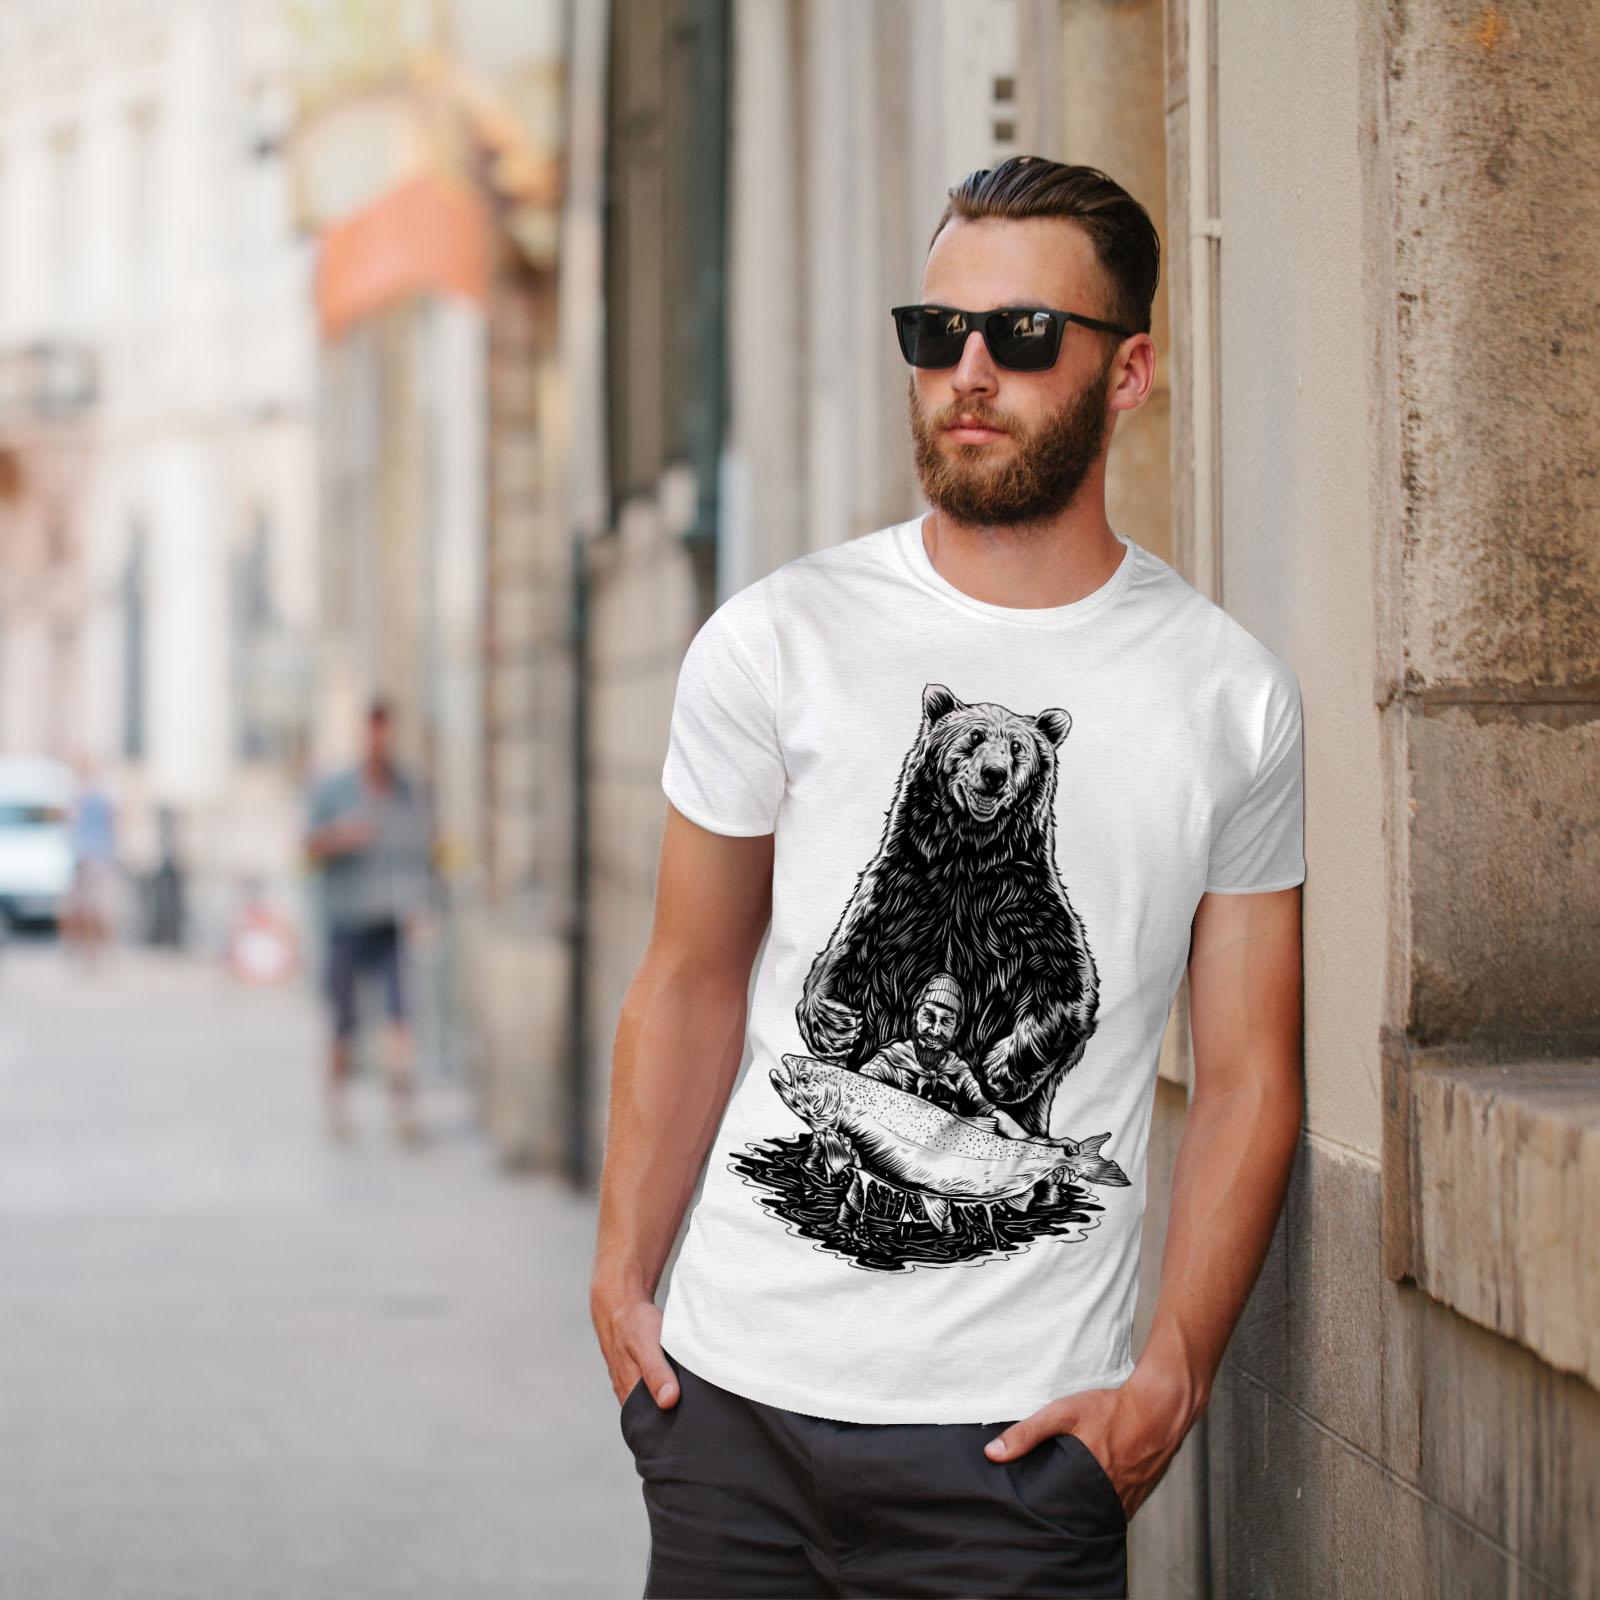 miniature 11 - Wellcoda Fishing Bear Angler Mens T-shirt, Grizzly Graphic Design Printed Tee